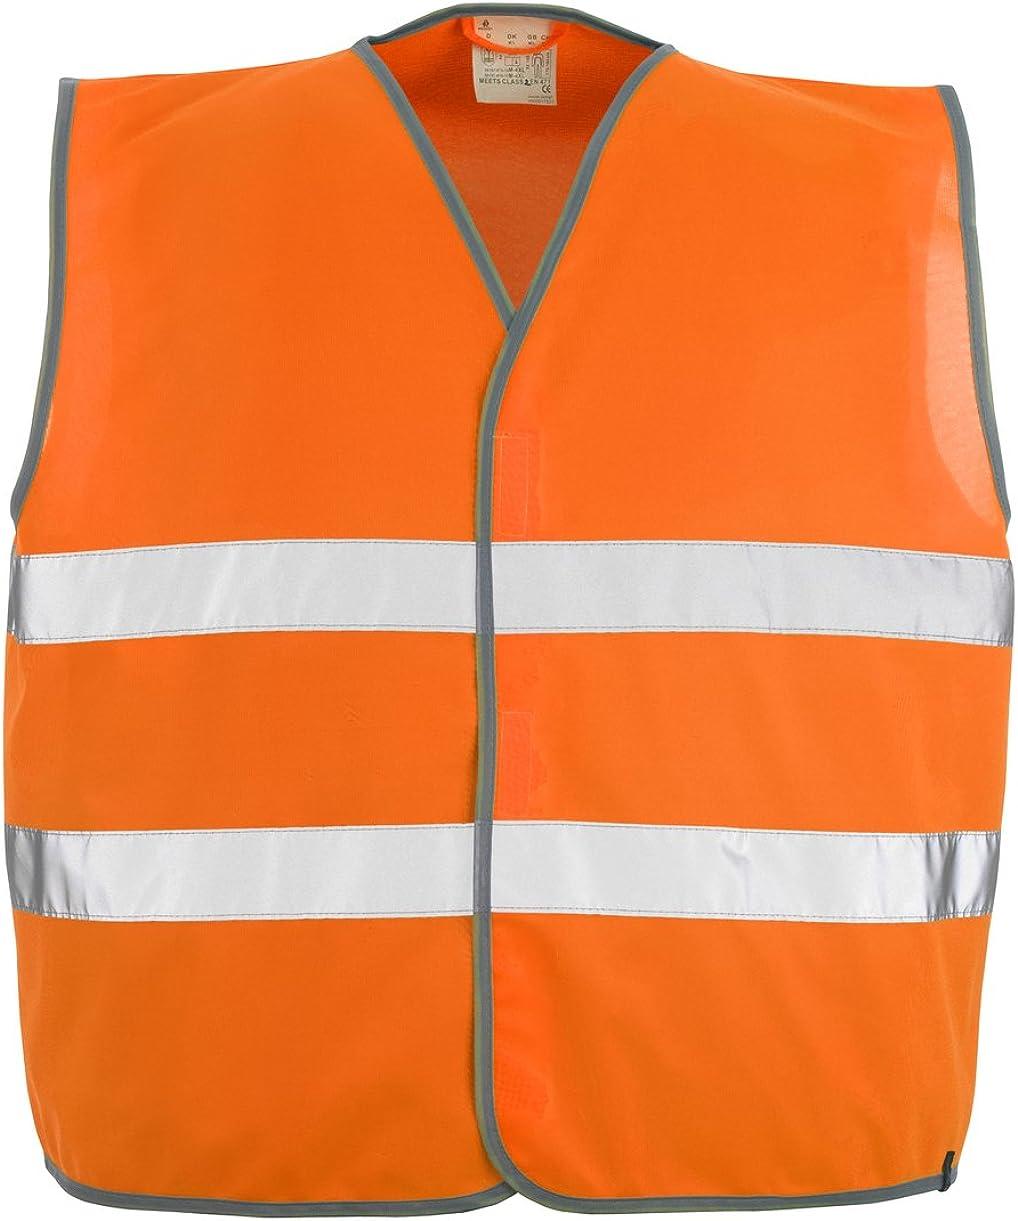 Mascot Weyburn Hi-Vis Traffic Vest 50187-874 - Safe Classic Mens